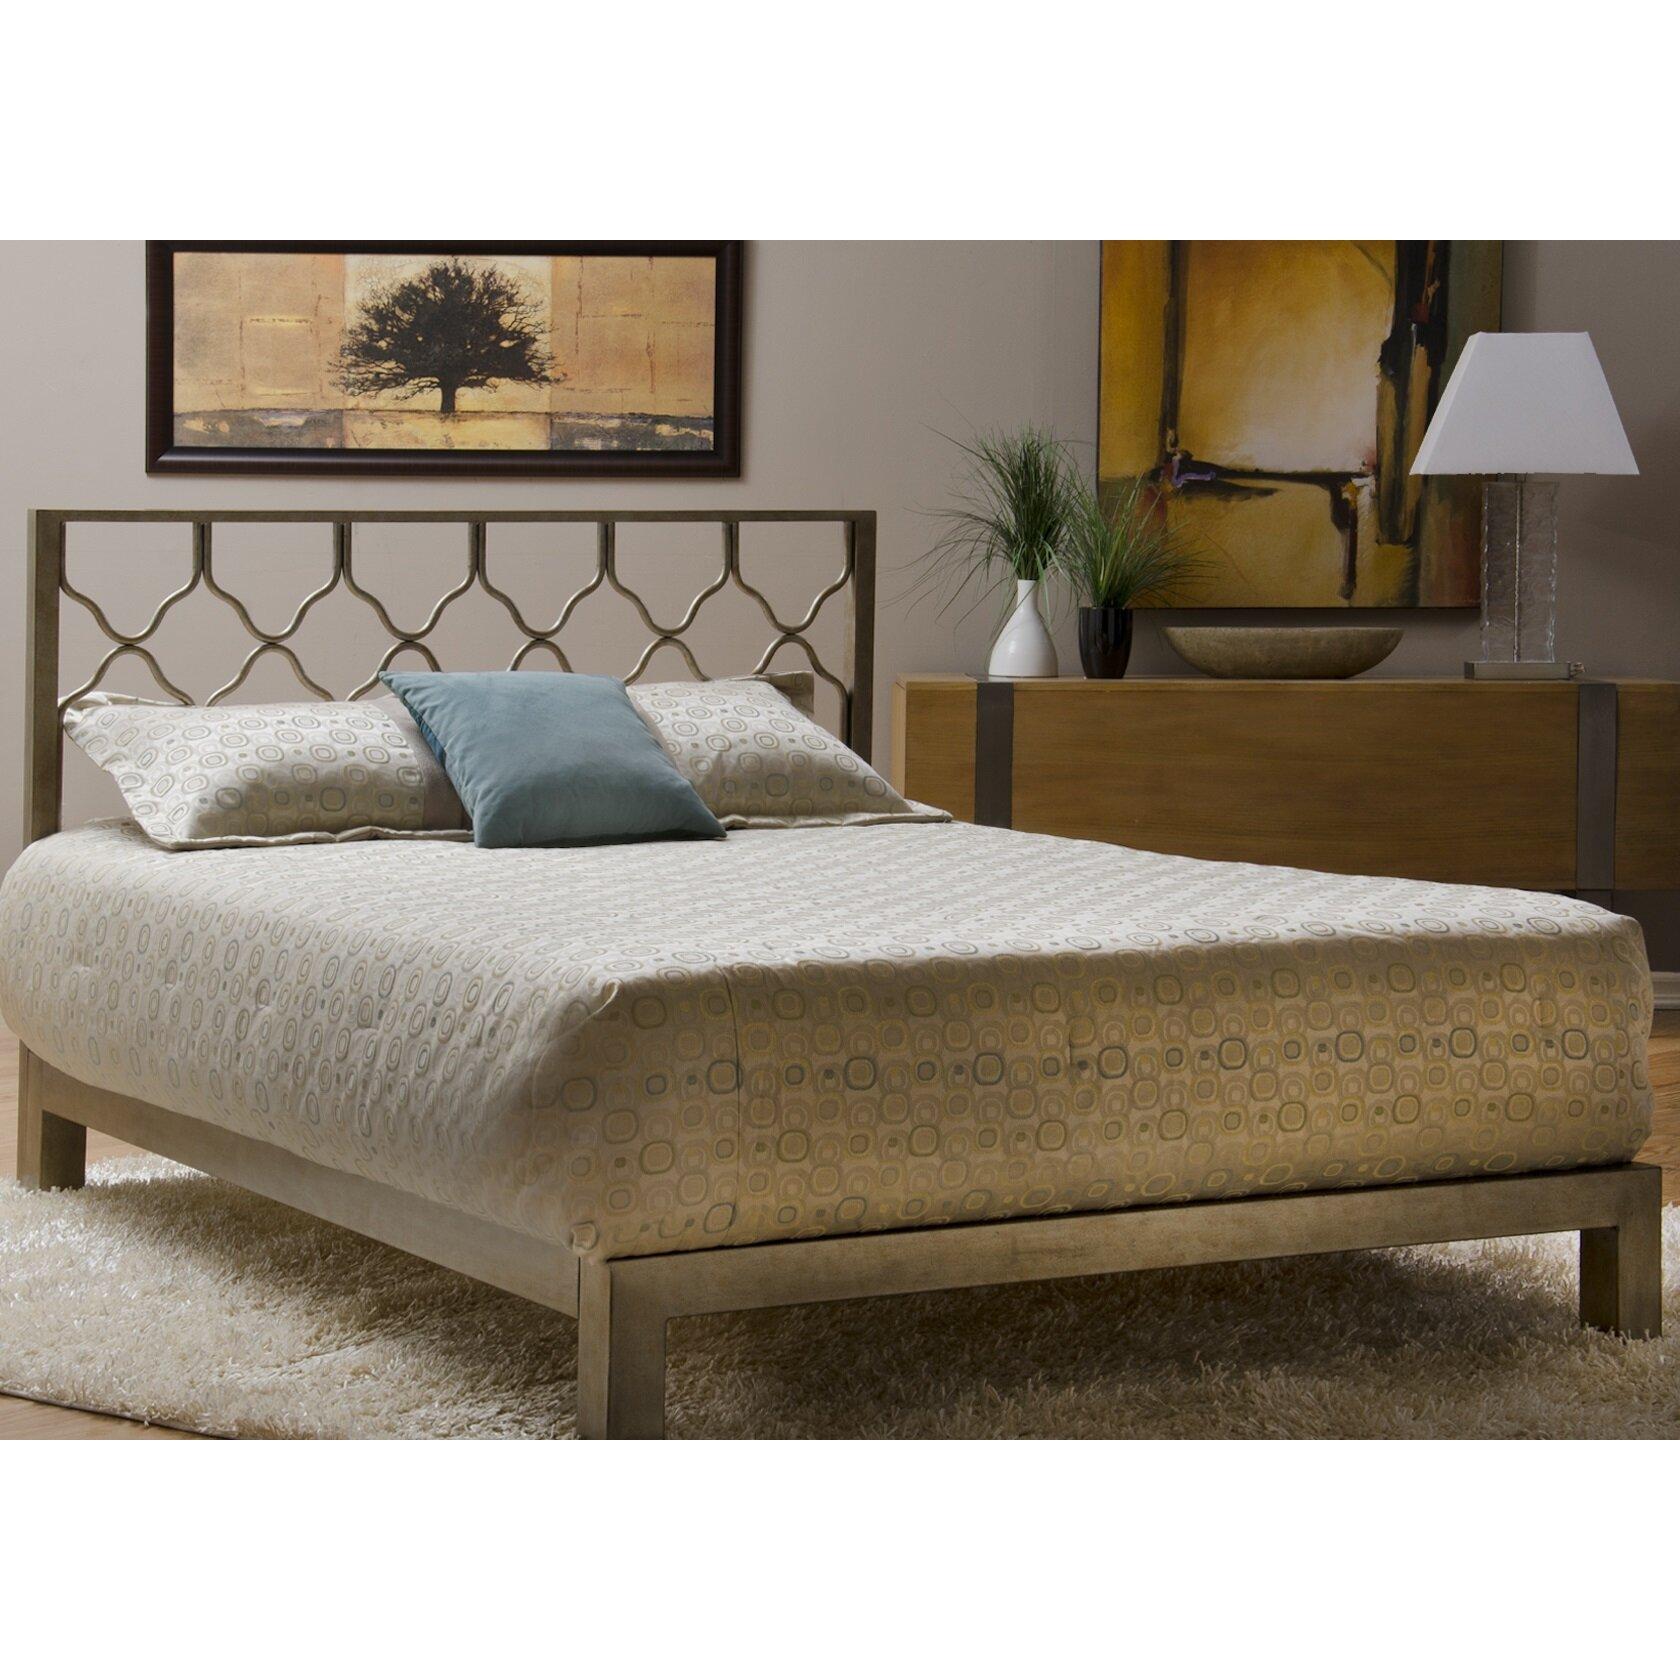 Gold metal bed